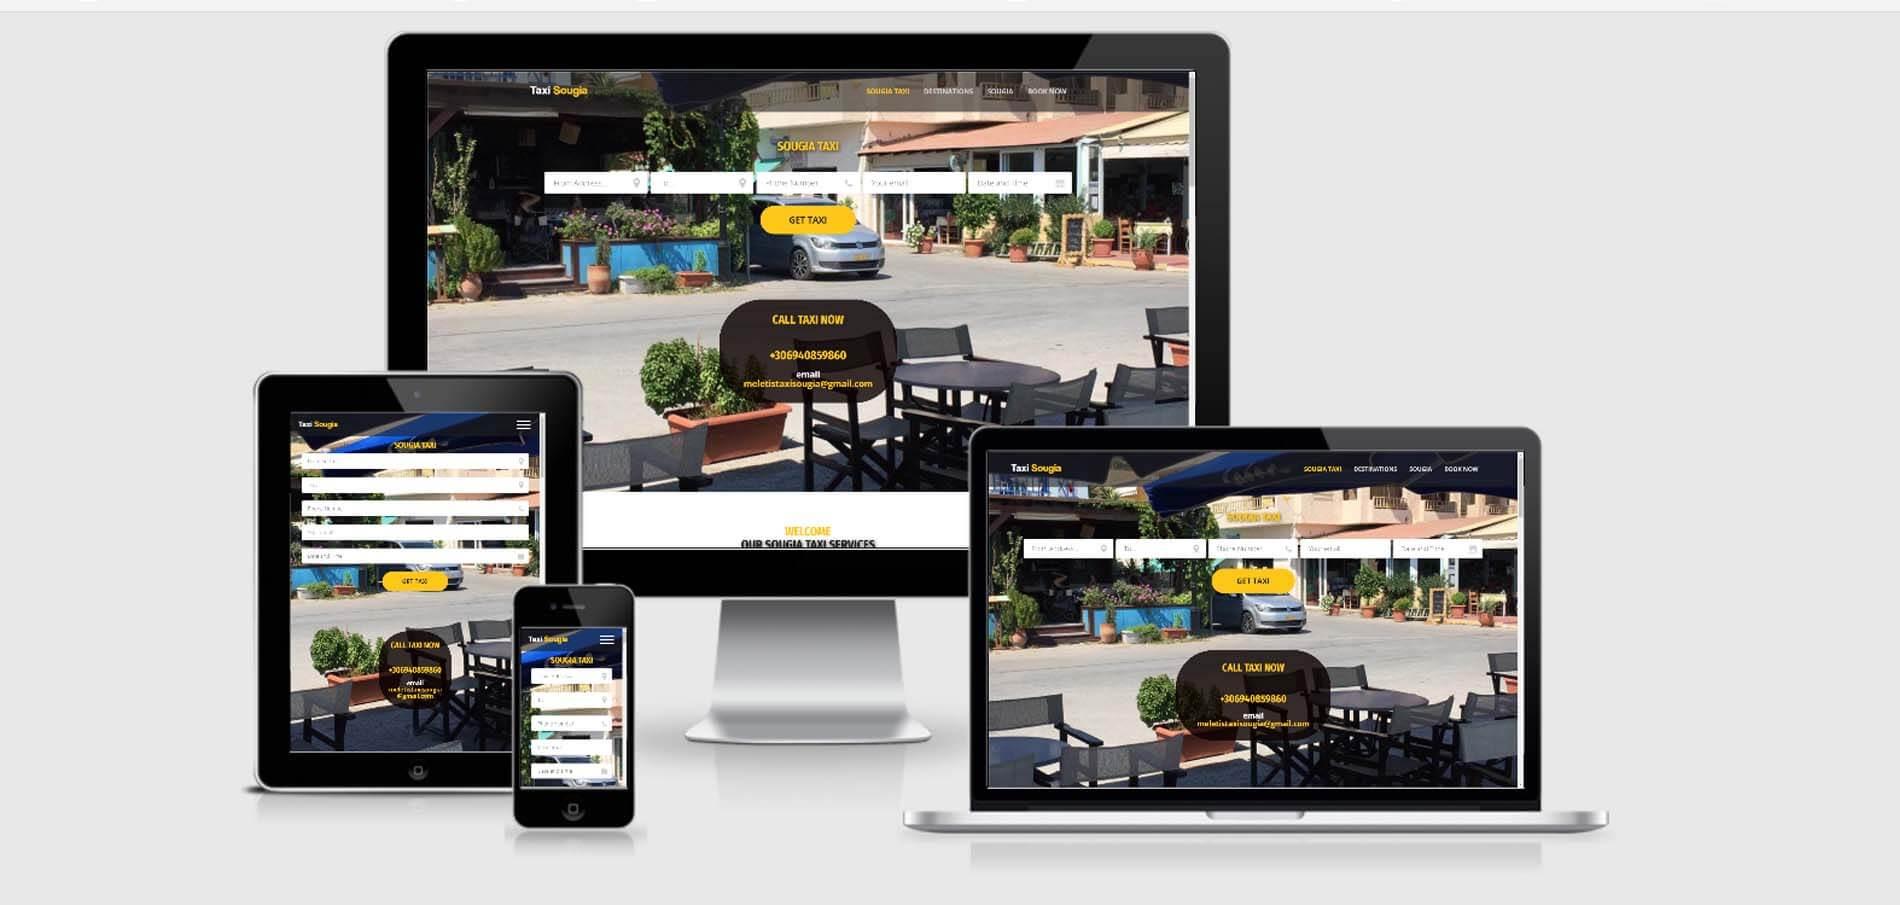 Sougia Taxi Services